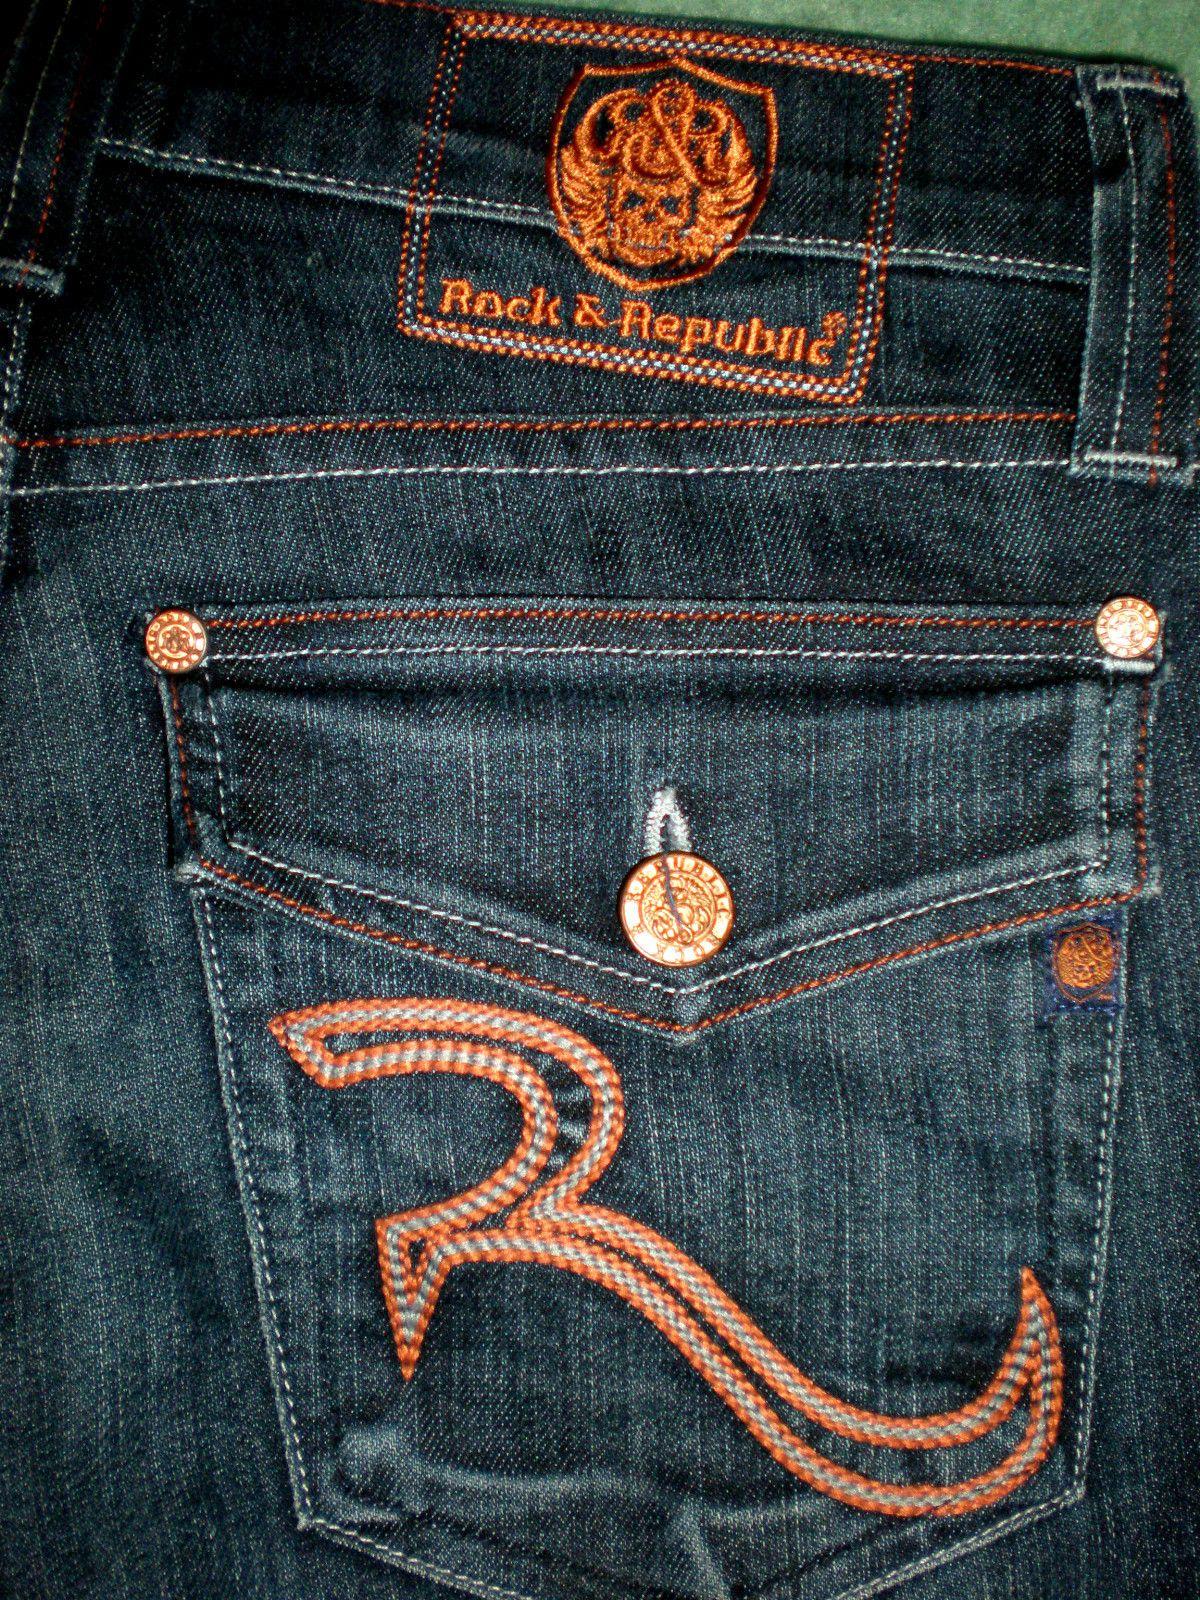 e3116bba4c1 Rock & Republic Jeans (Taylow Low Rise Button Fly Bootcut, Orange  Stitching, Men's Pre-owned Brand Name Jean Pants)